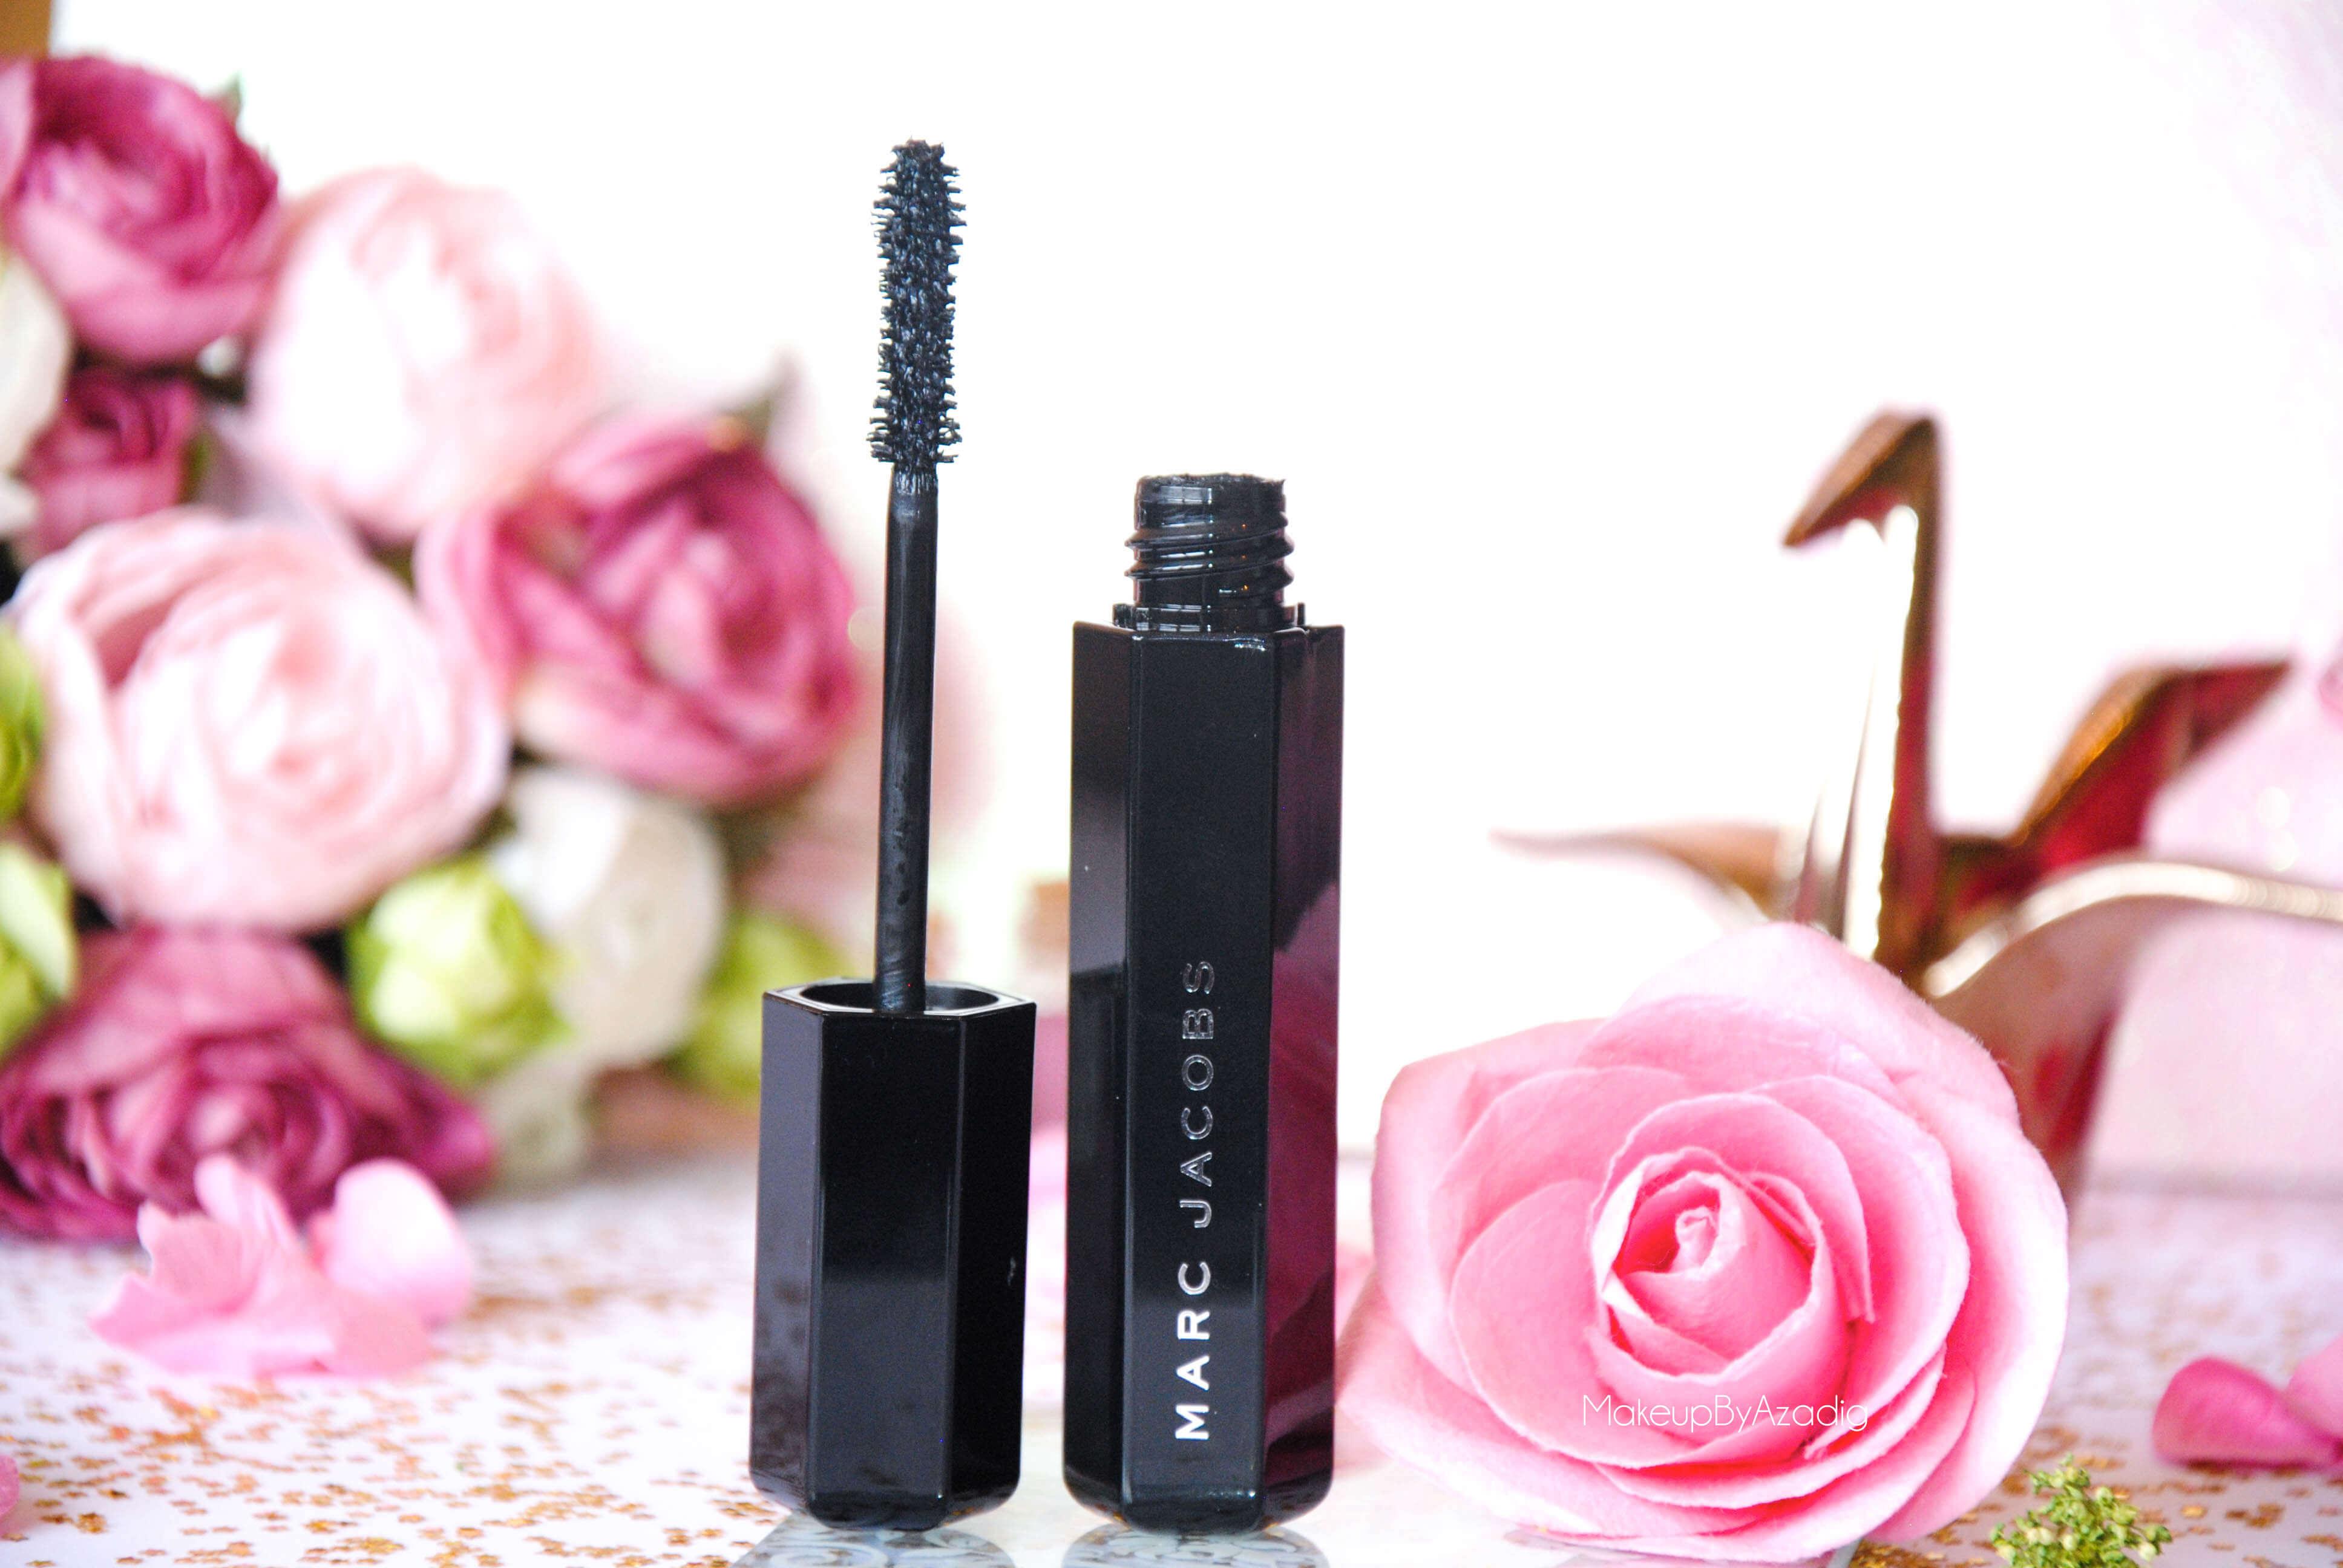 velvet noir-volume spectaculaire-marc jacobs-makeupbyazadig-revue-review-mascara-noir intense-miniature